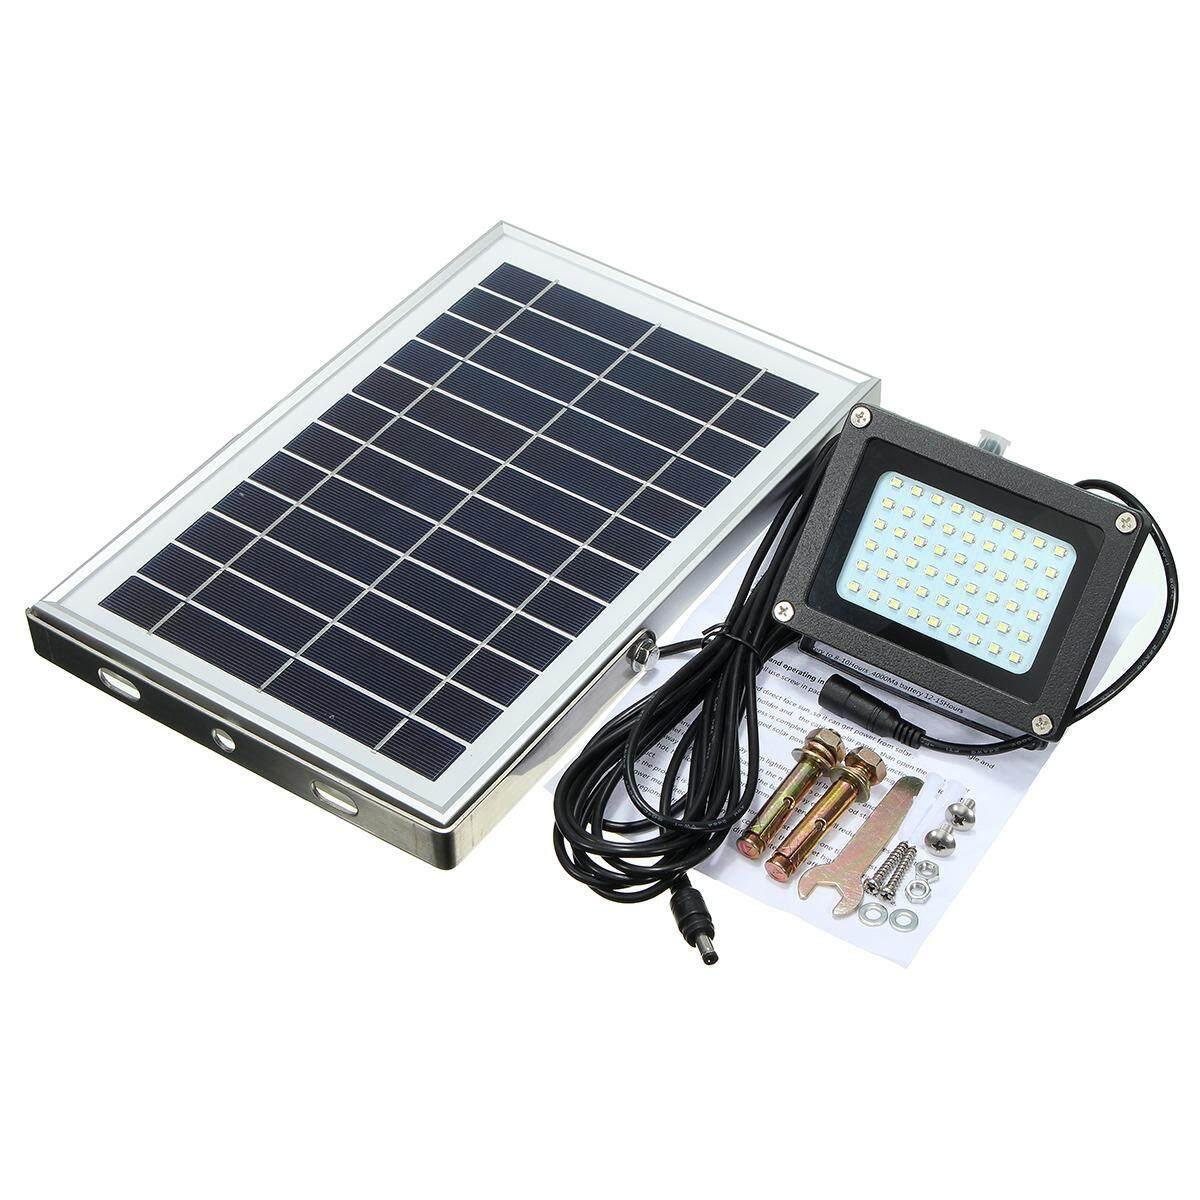 ... Sangat Tipis 28 Mm 36 Watt Off Road Ringan Bar 12 Cree Memimpin. Source · 54 LED Solar Powered Tahan Air Keamanan Outdoor Lampu Sorot W/Panel-Hitam-